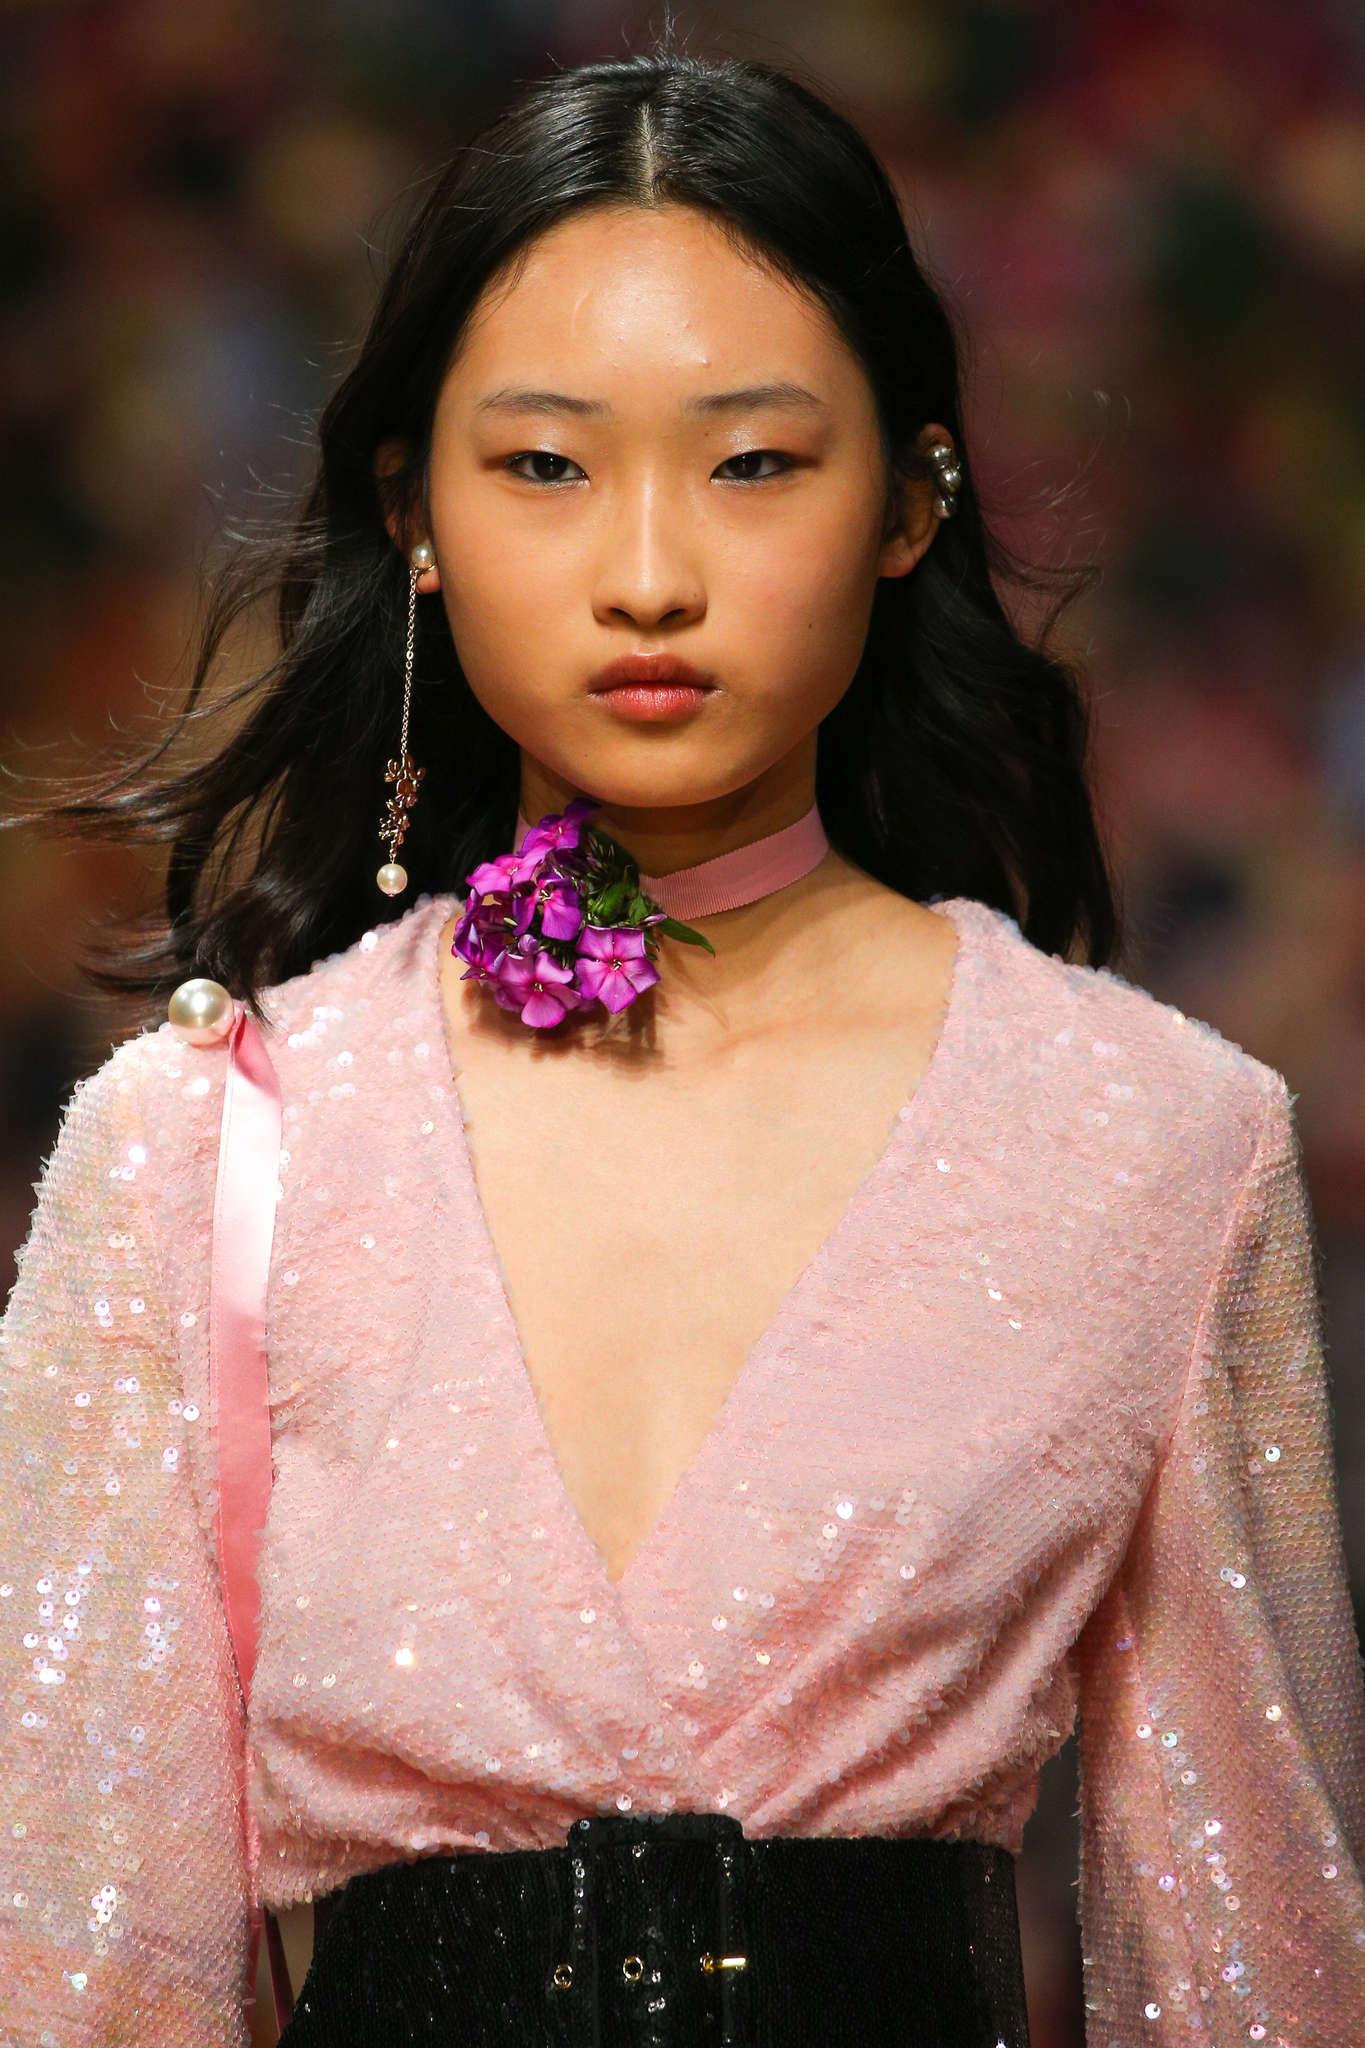 ingie paris pink flower choker.jpg